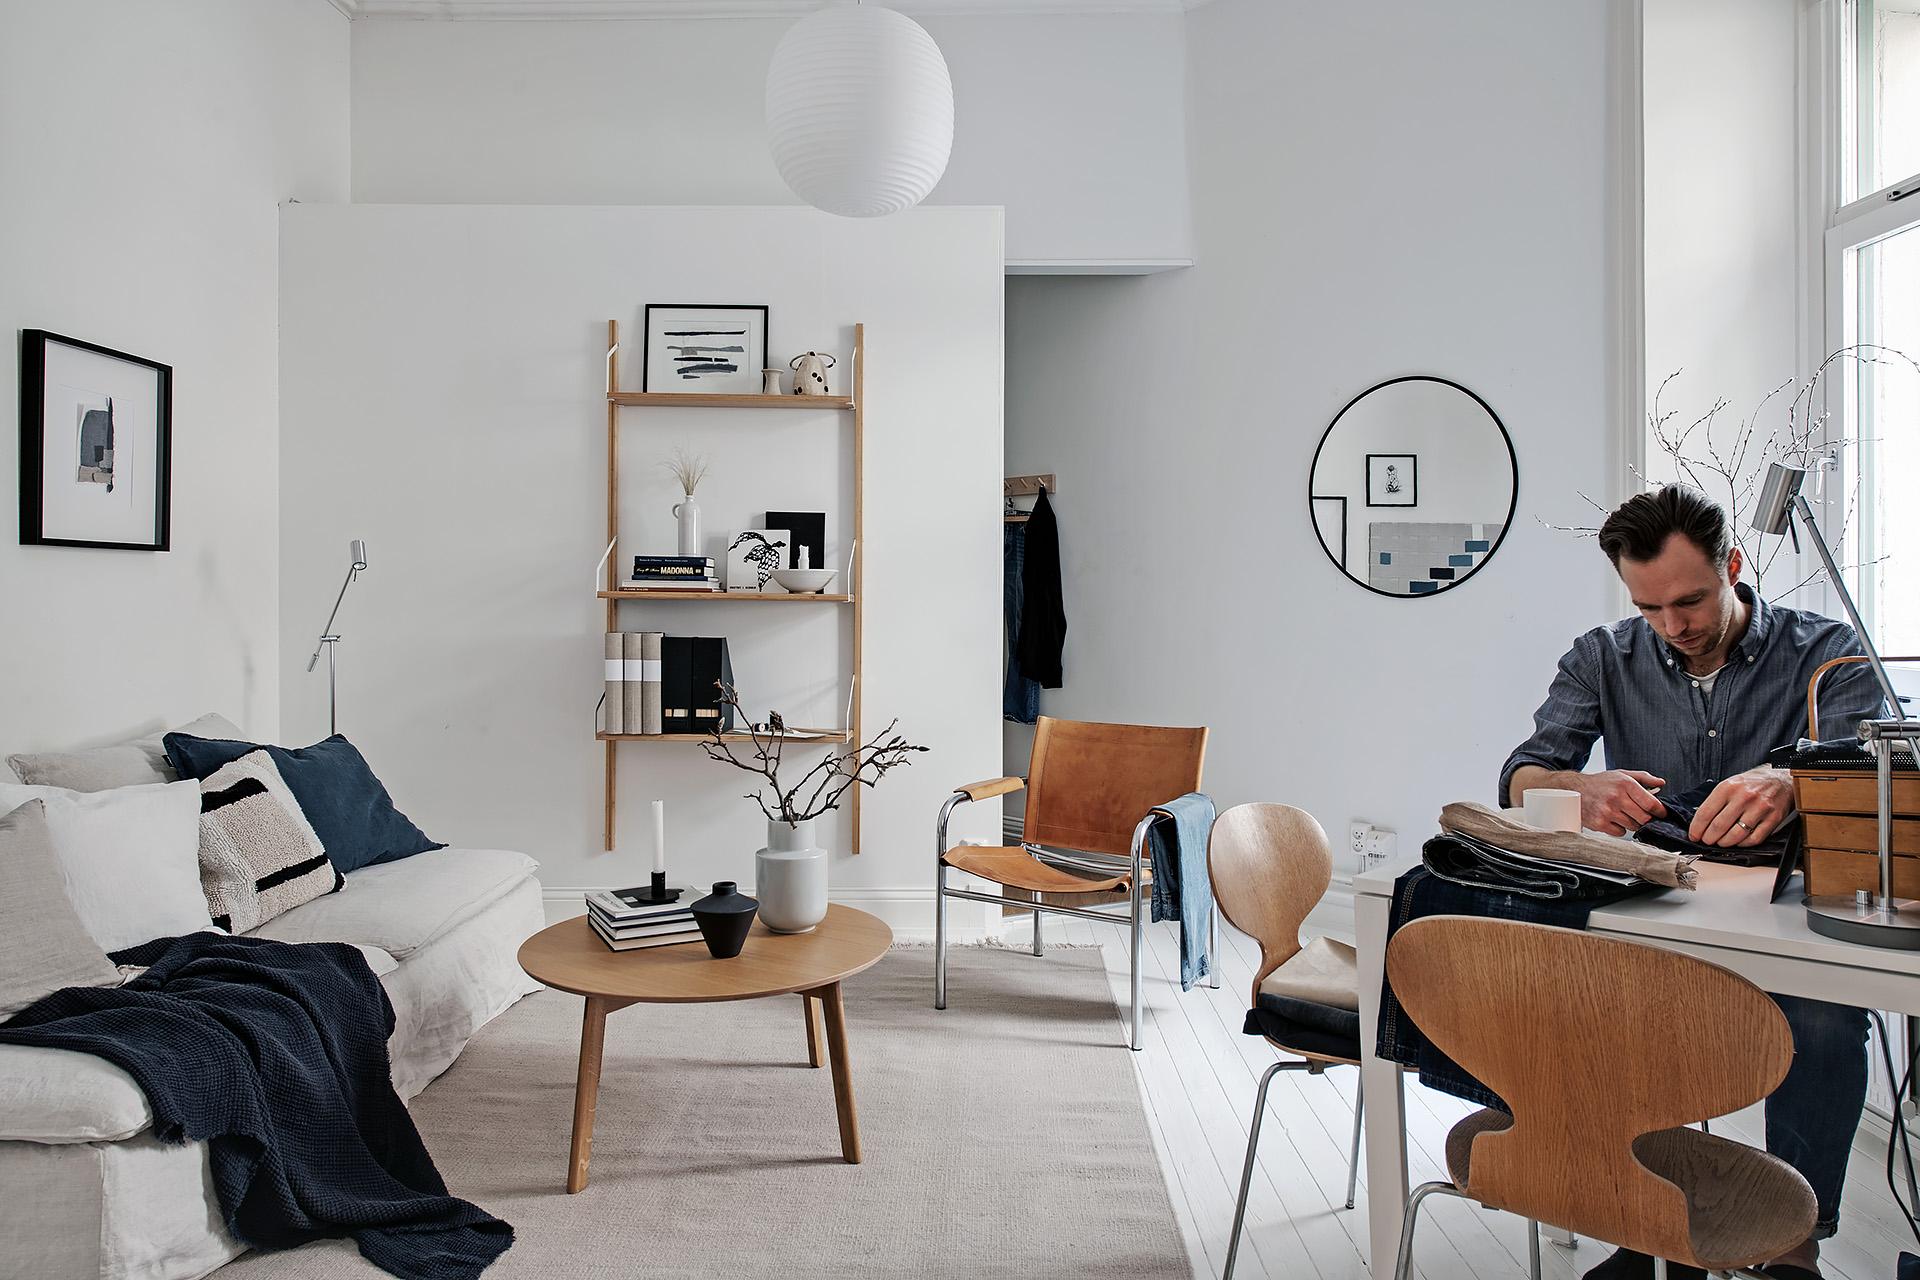 Modern living room with blue denim accents / via @kronekern